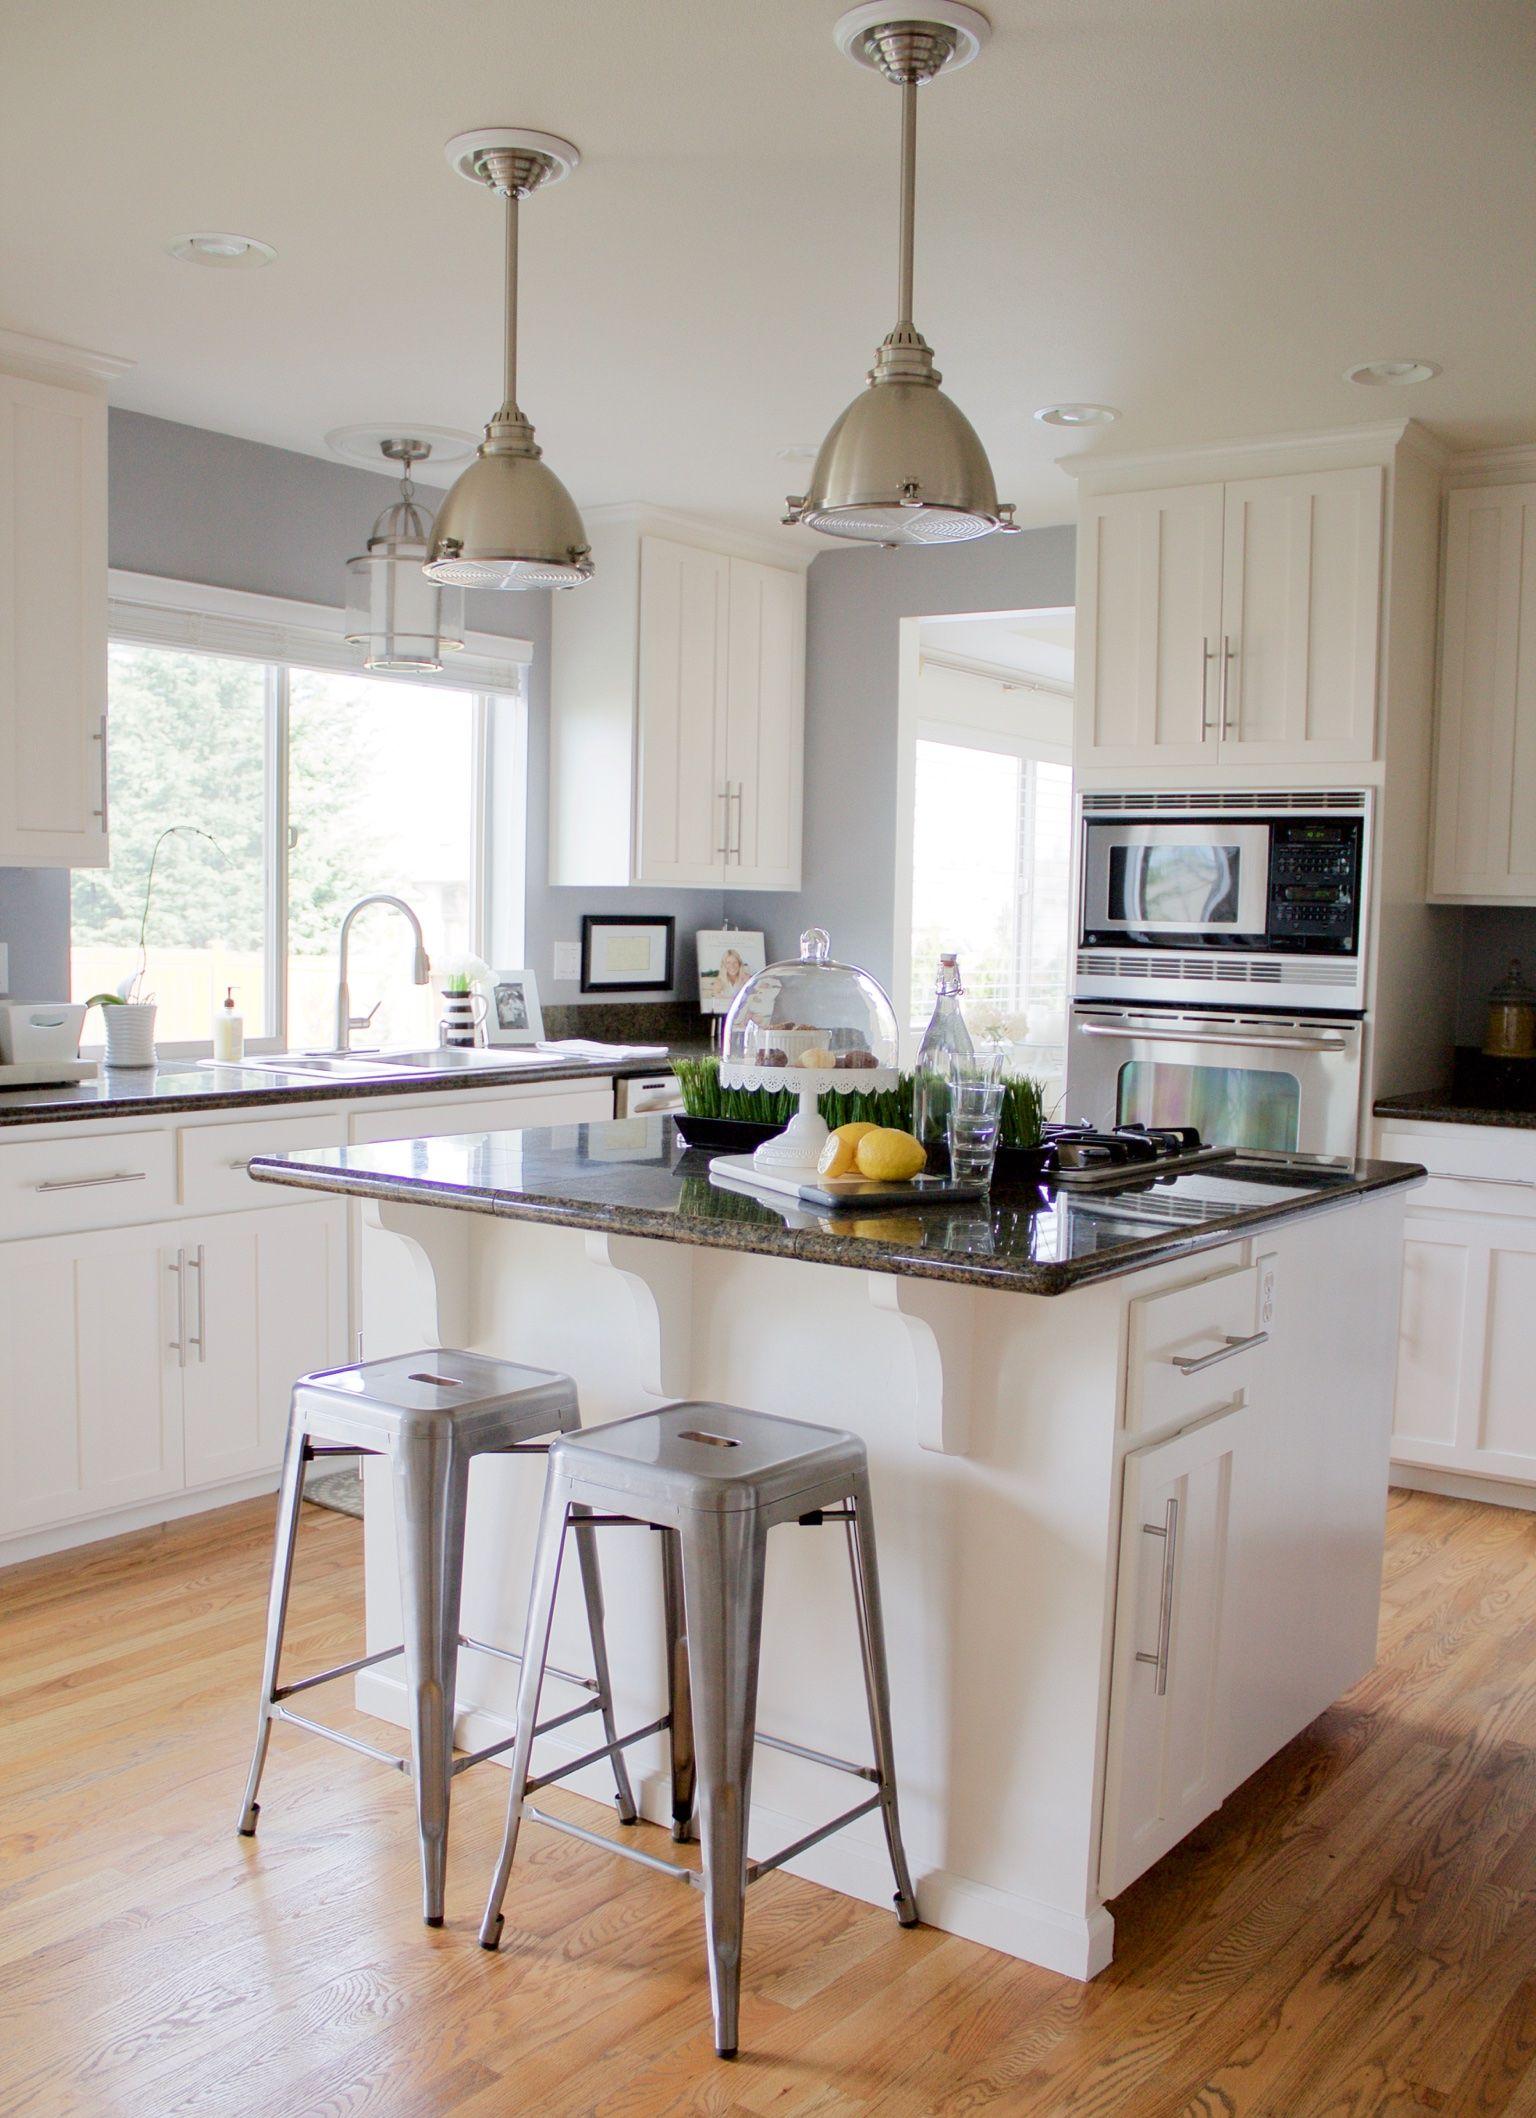 White kitchen by lemon design editing lemon design editing past